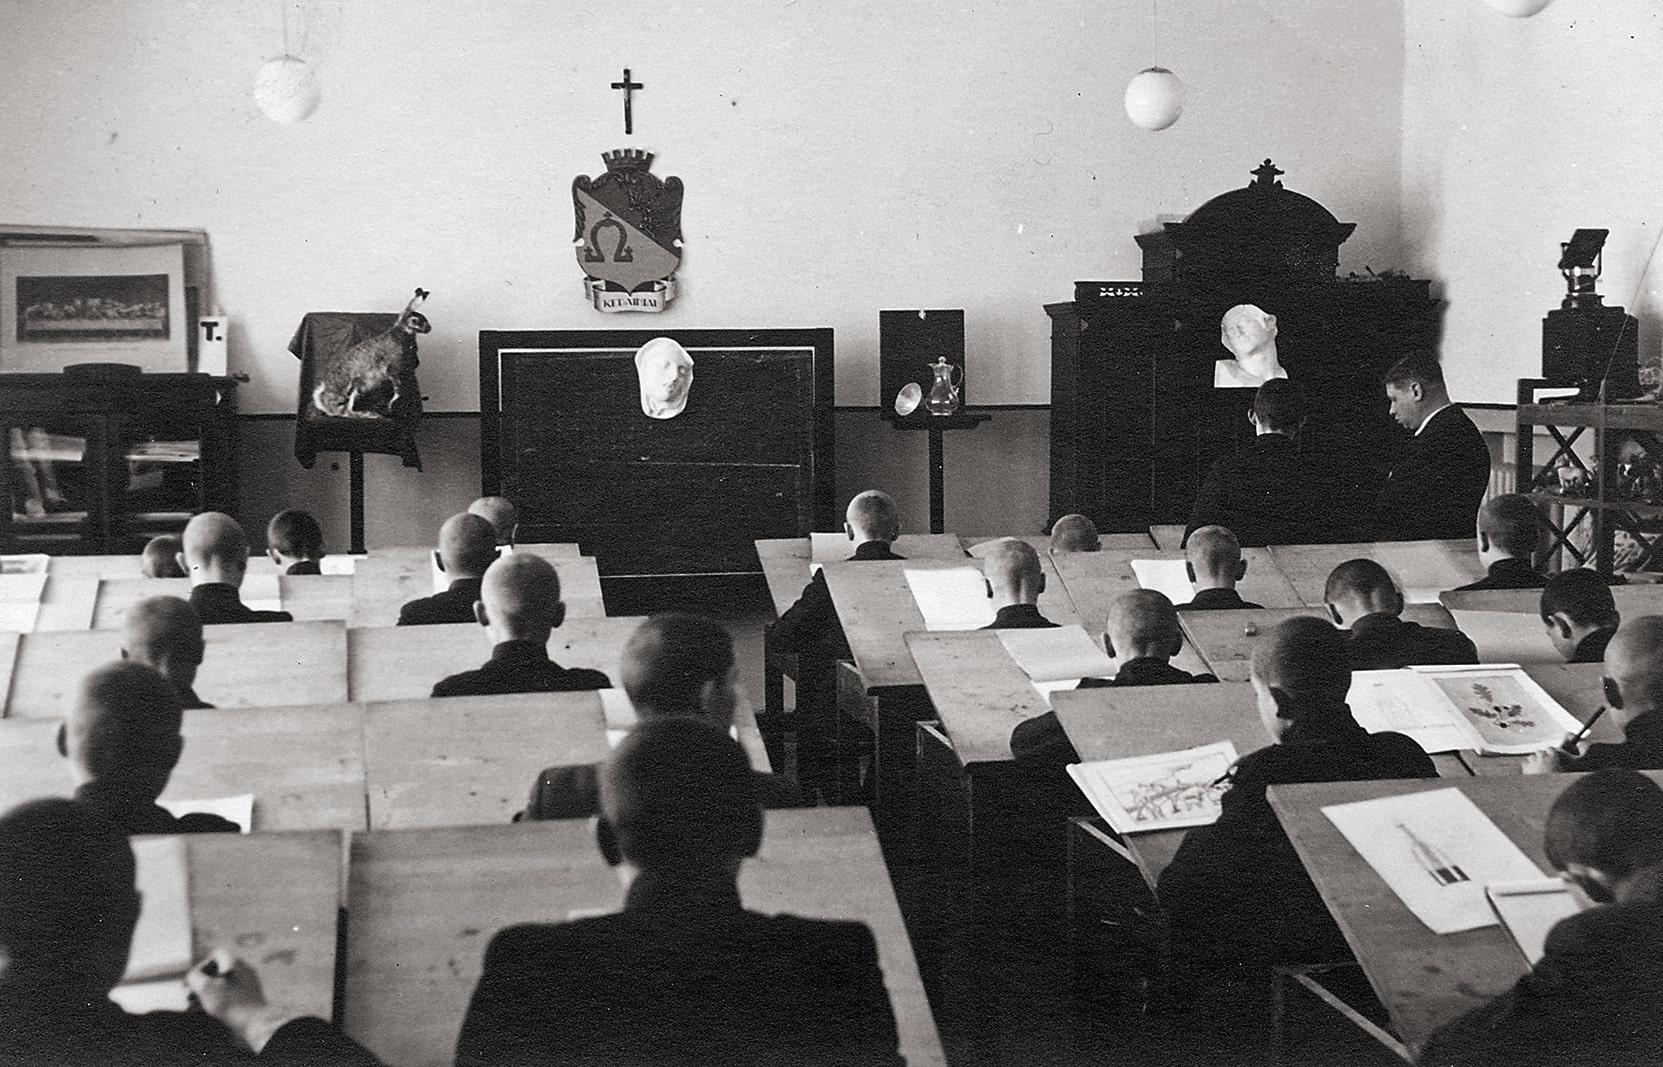 Piešimo pamoka gimnazijoje, XX a. 4 deš.